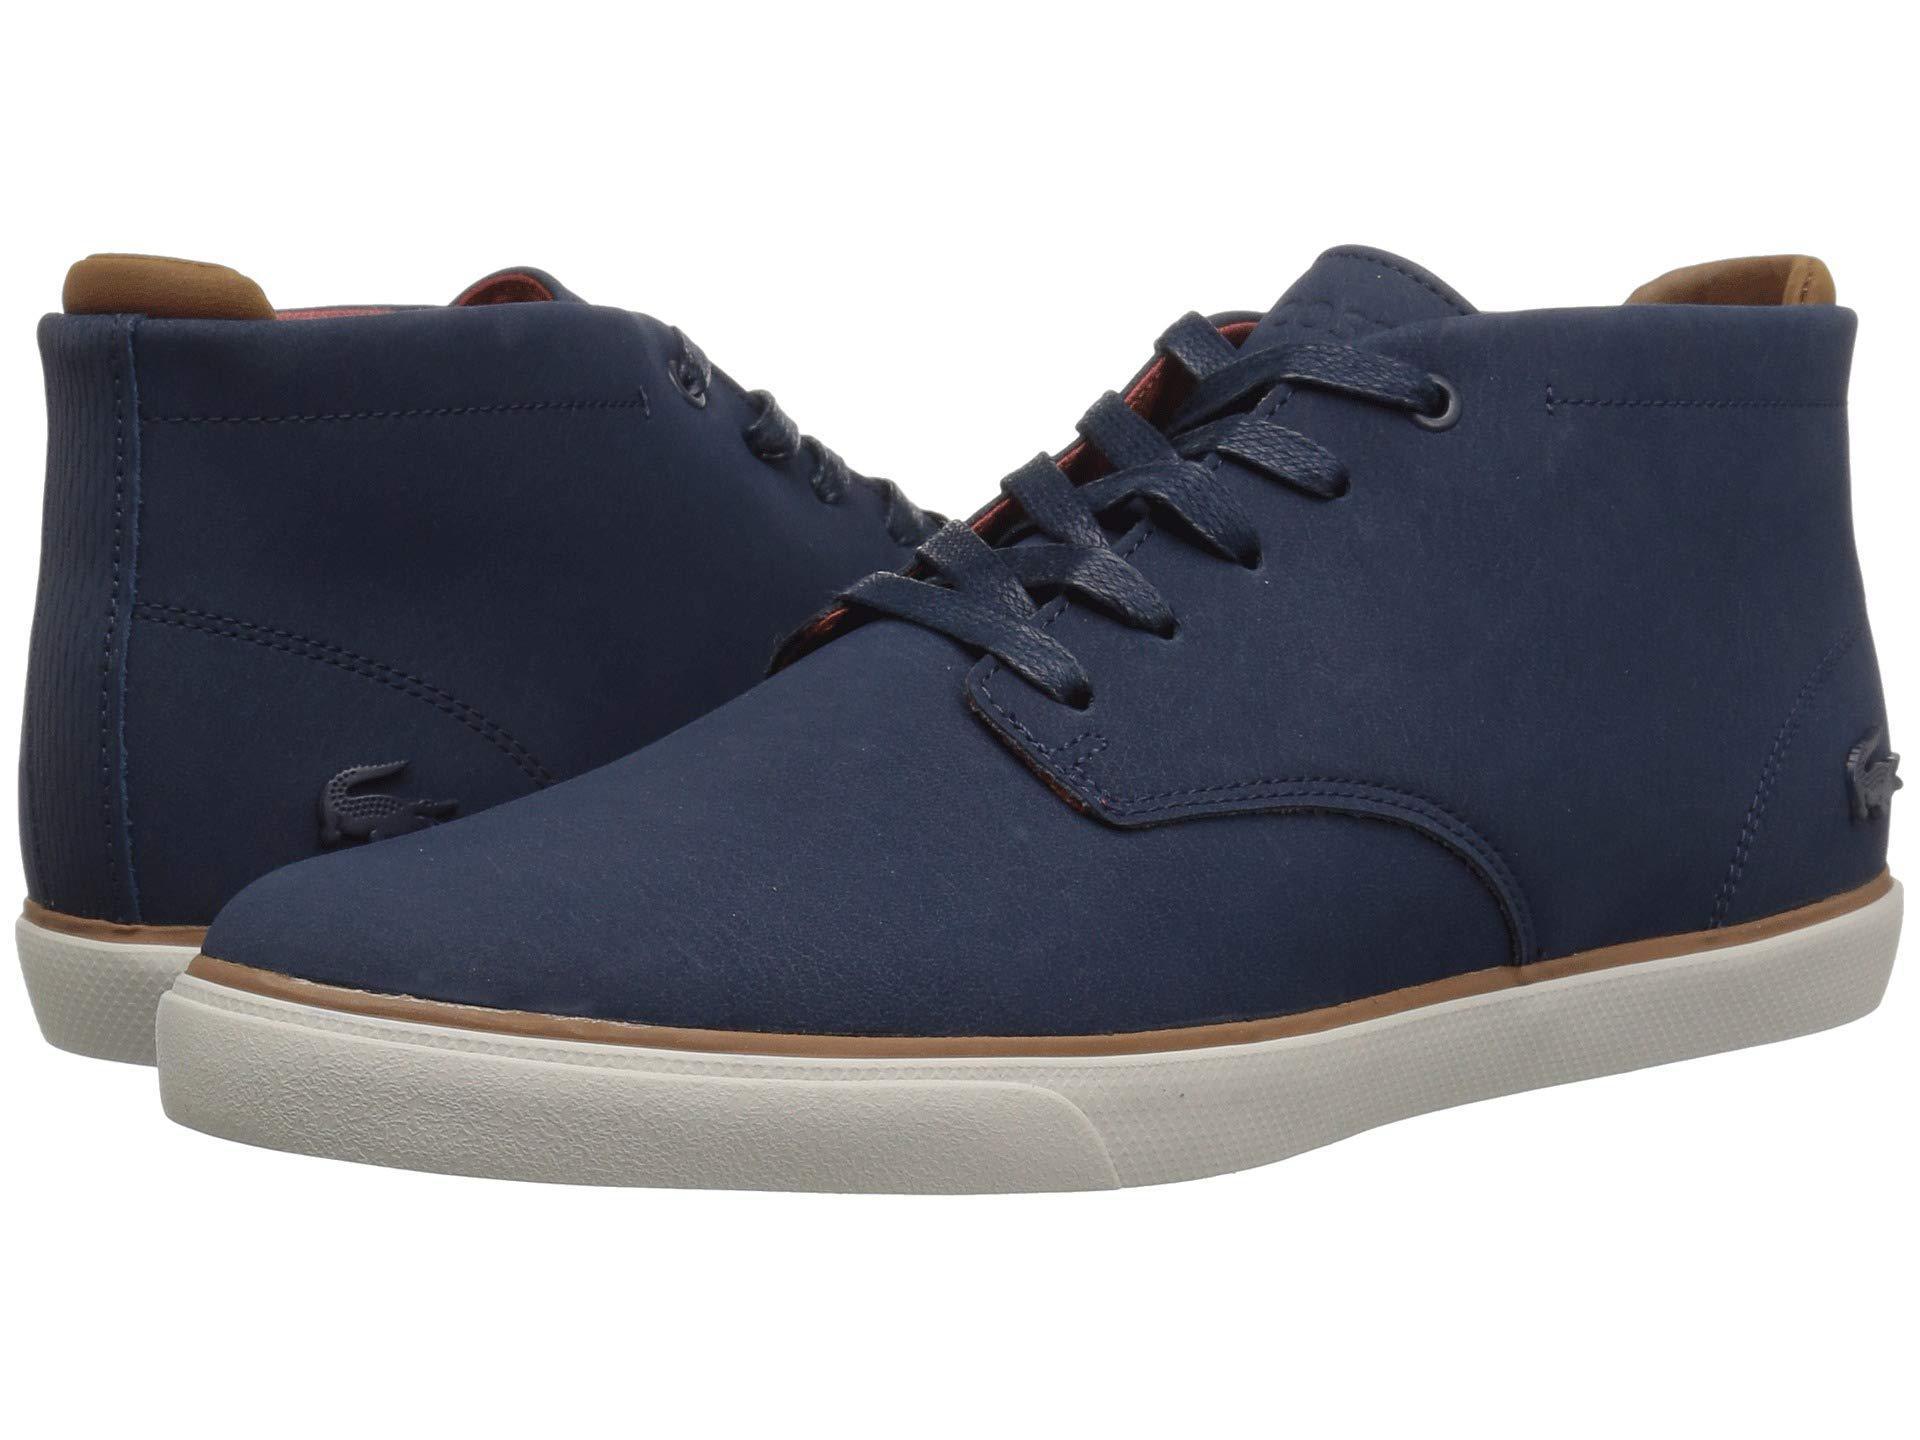 18b1231c7d98 Lyst - Lacoste Esparre Chukka 318 1 (navy brown) Men s Shoes in Blue ...